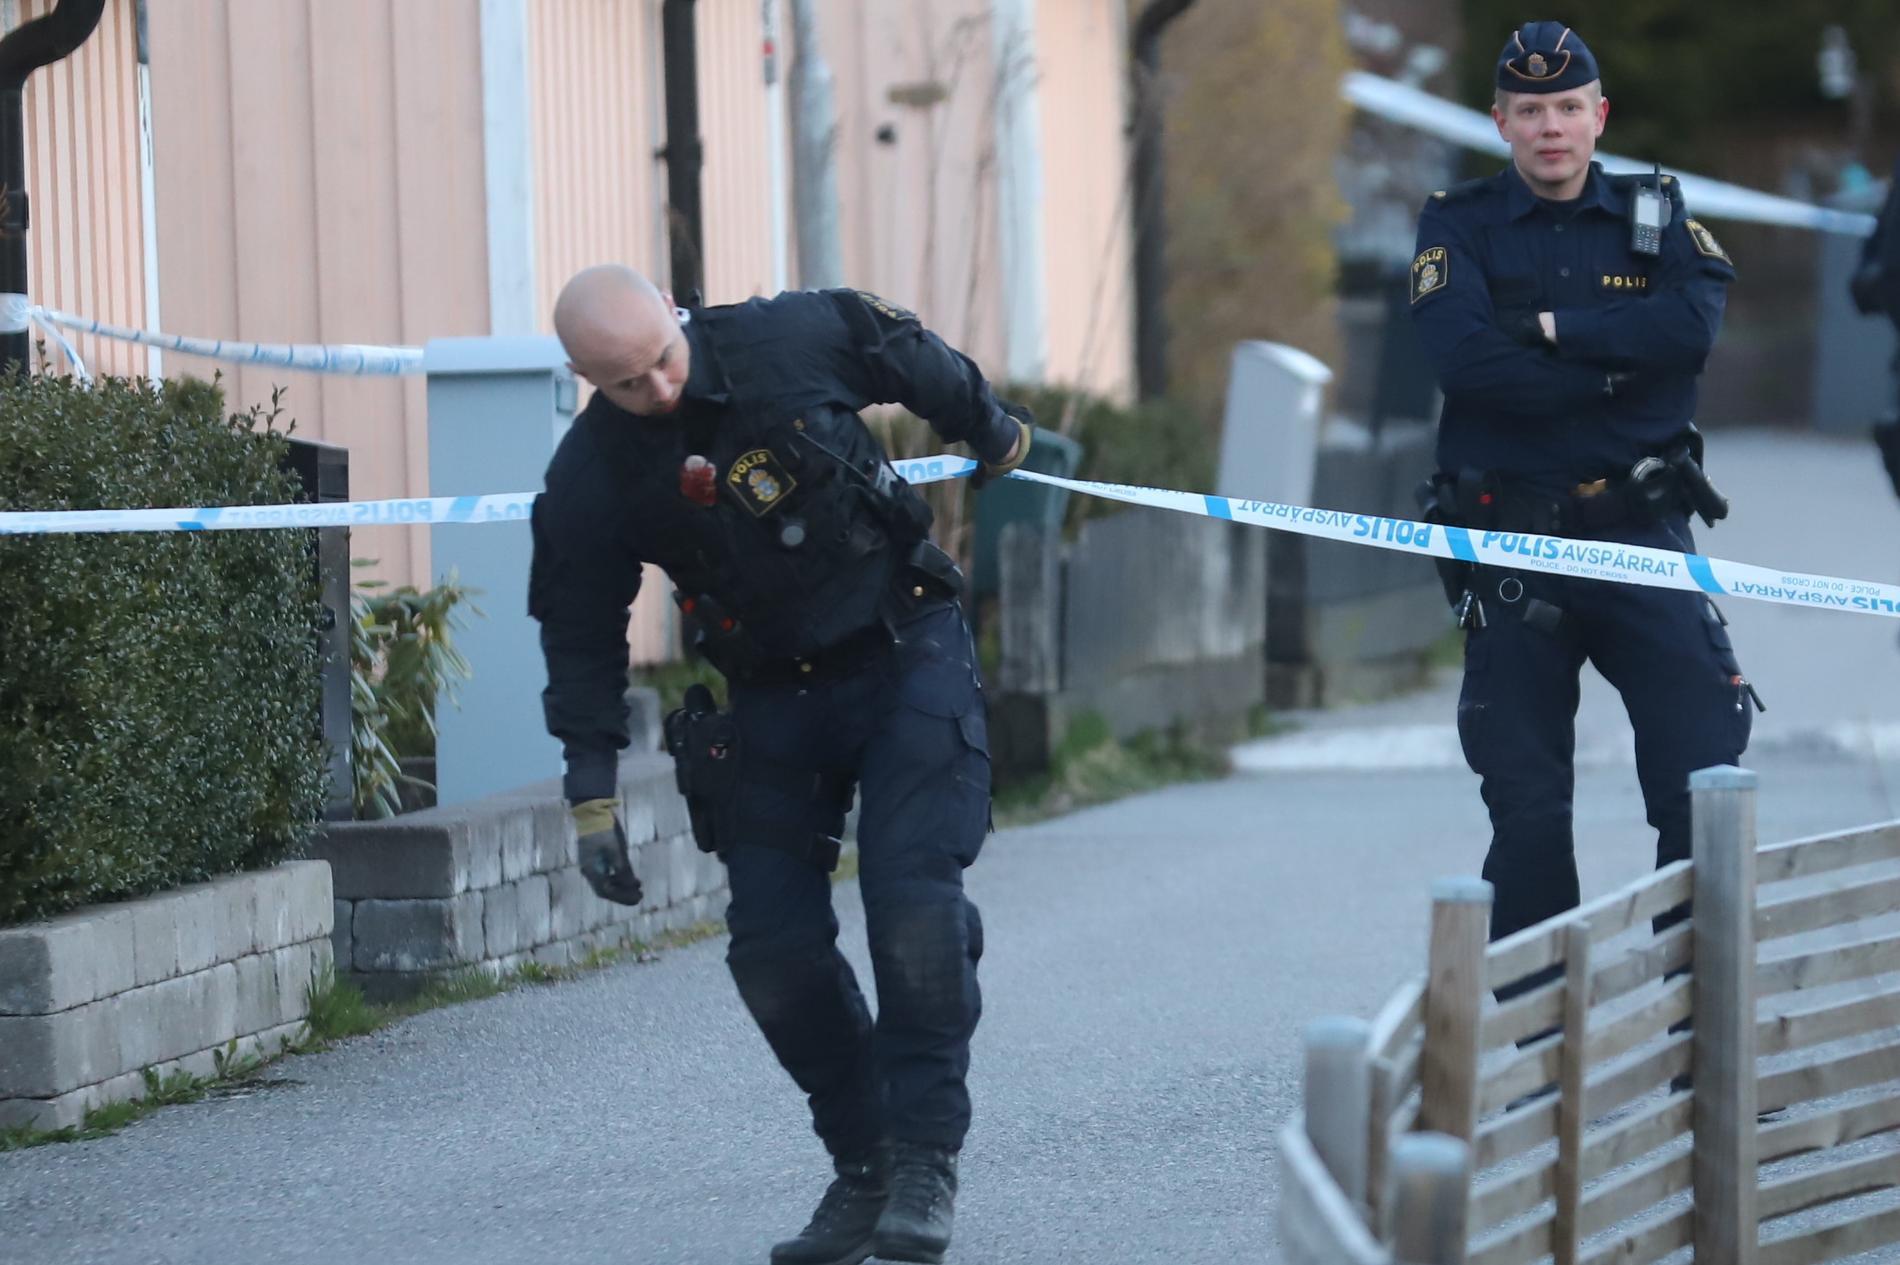 Den tredje explosionen skedde i Skogås, söder om Stockholm.